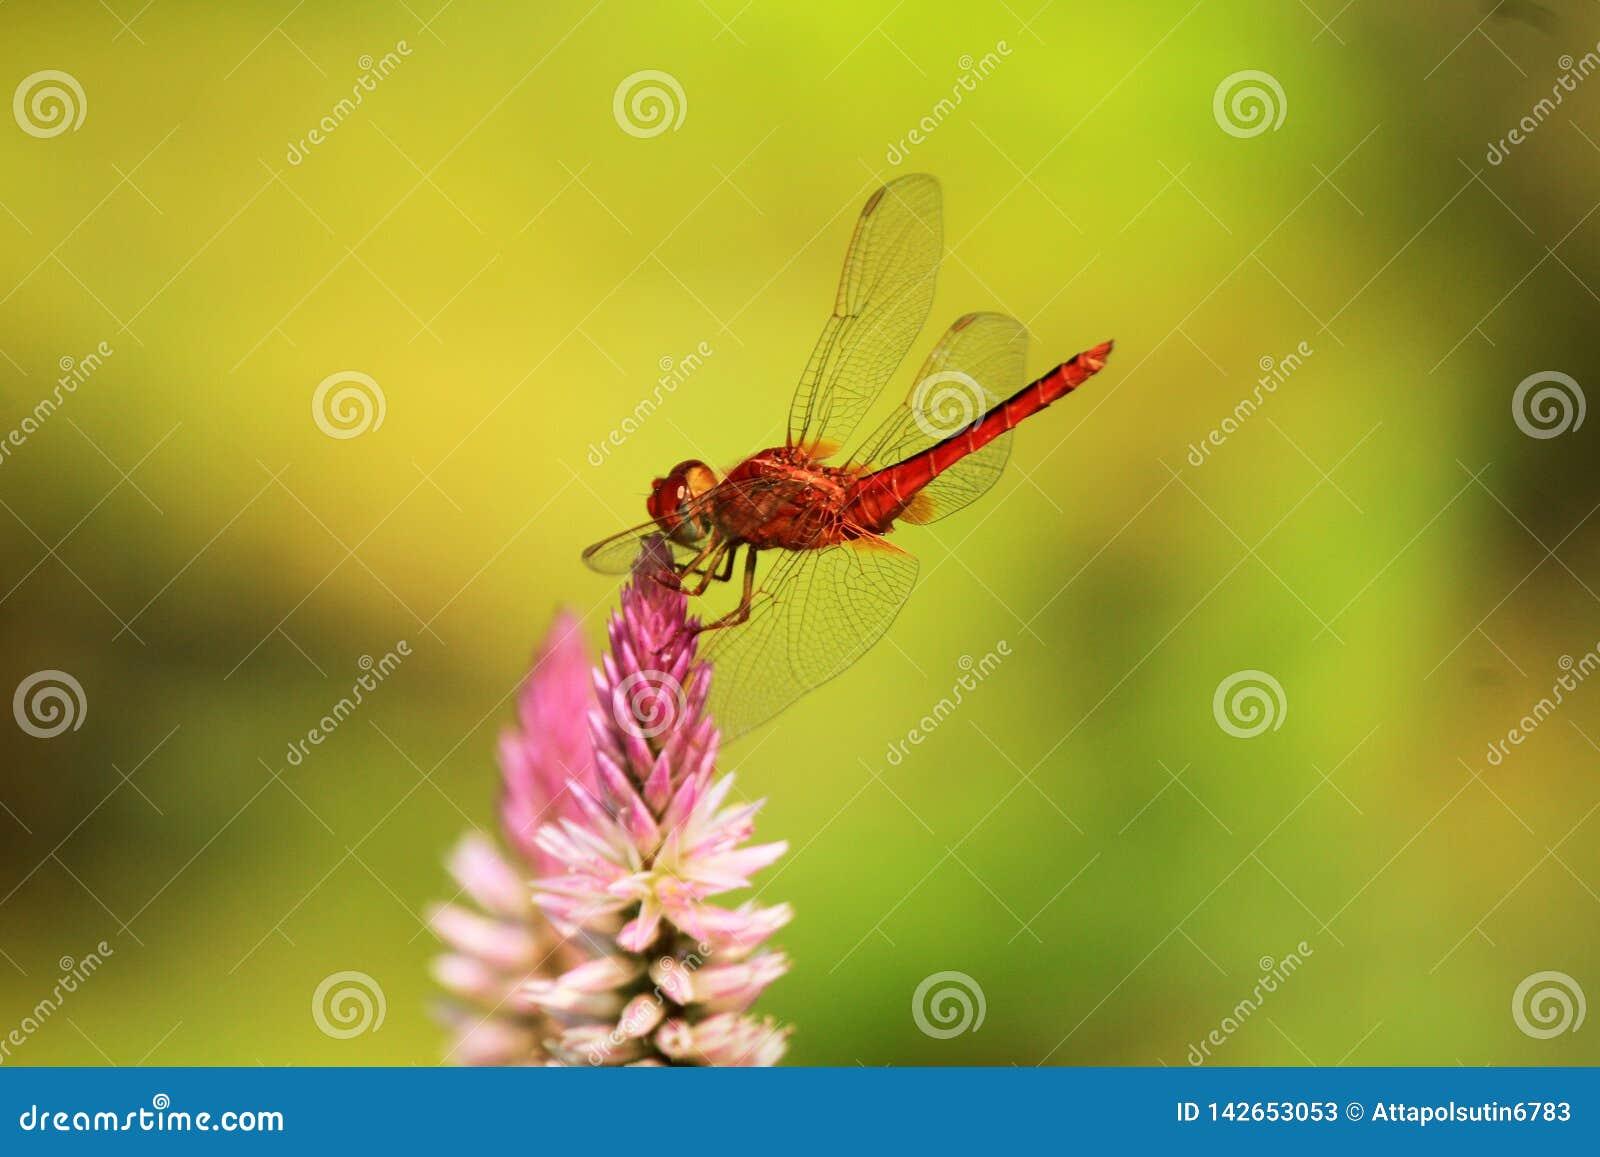 Libellenlandung auf Spitzenblume